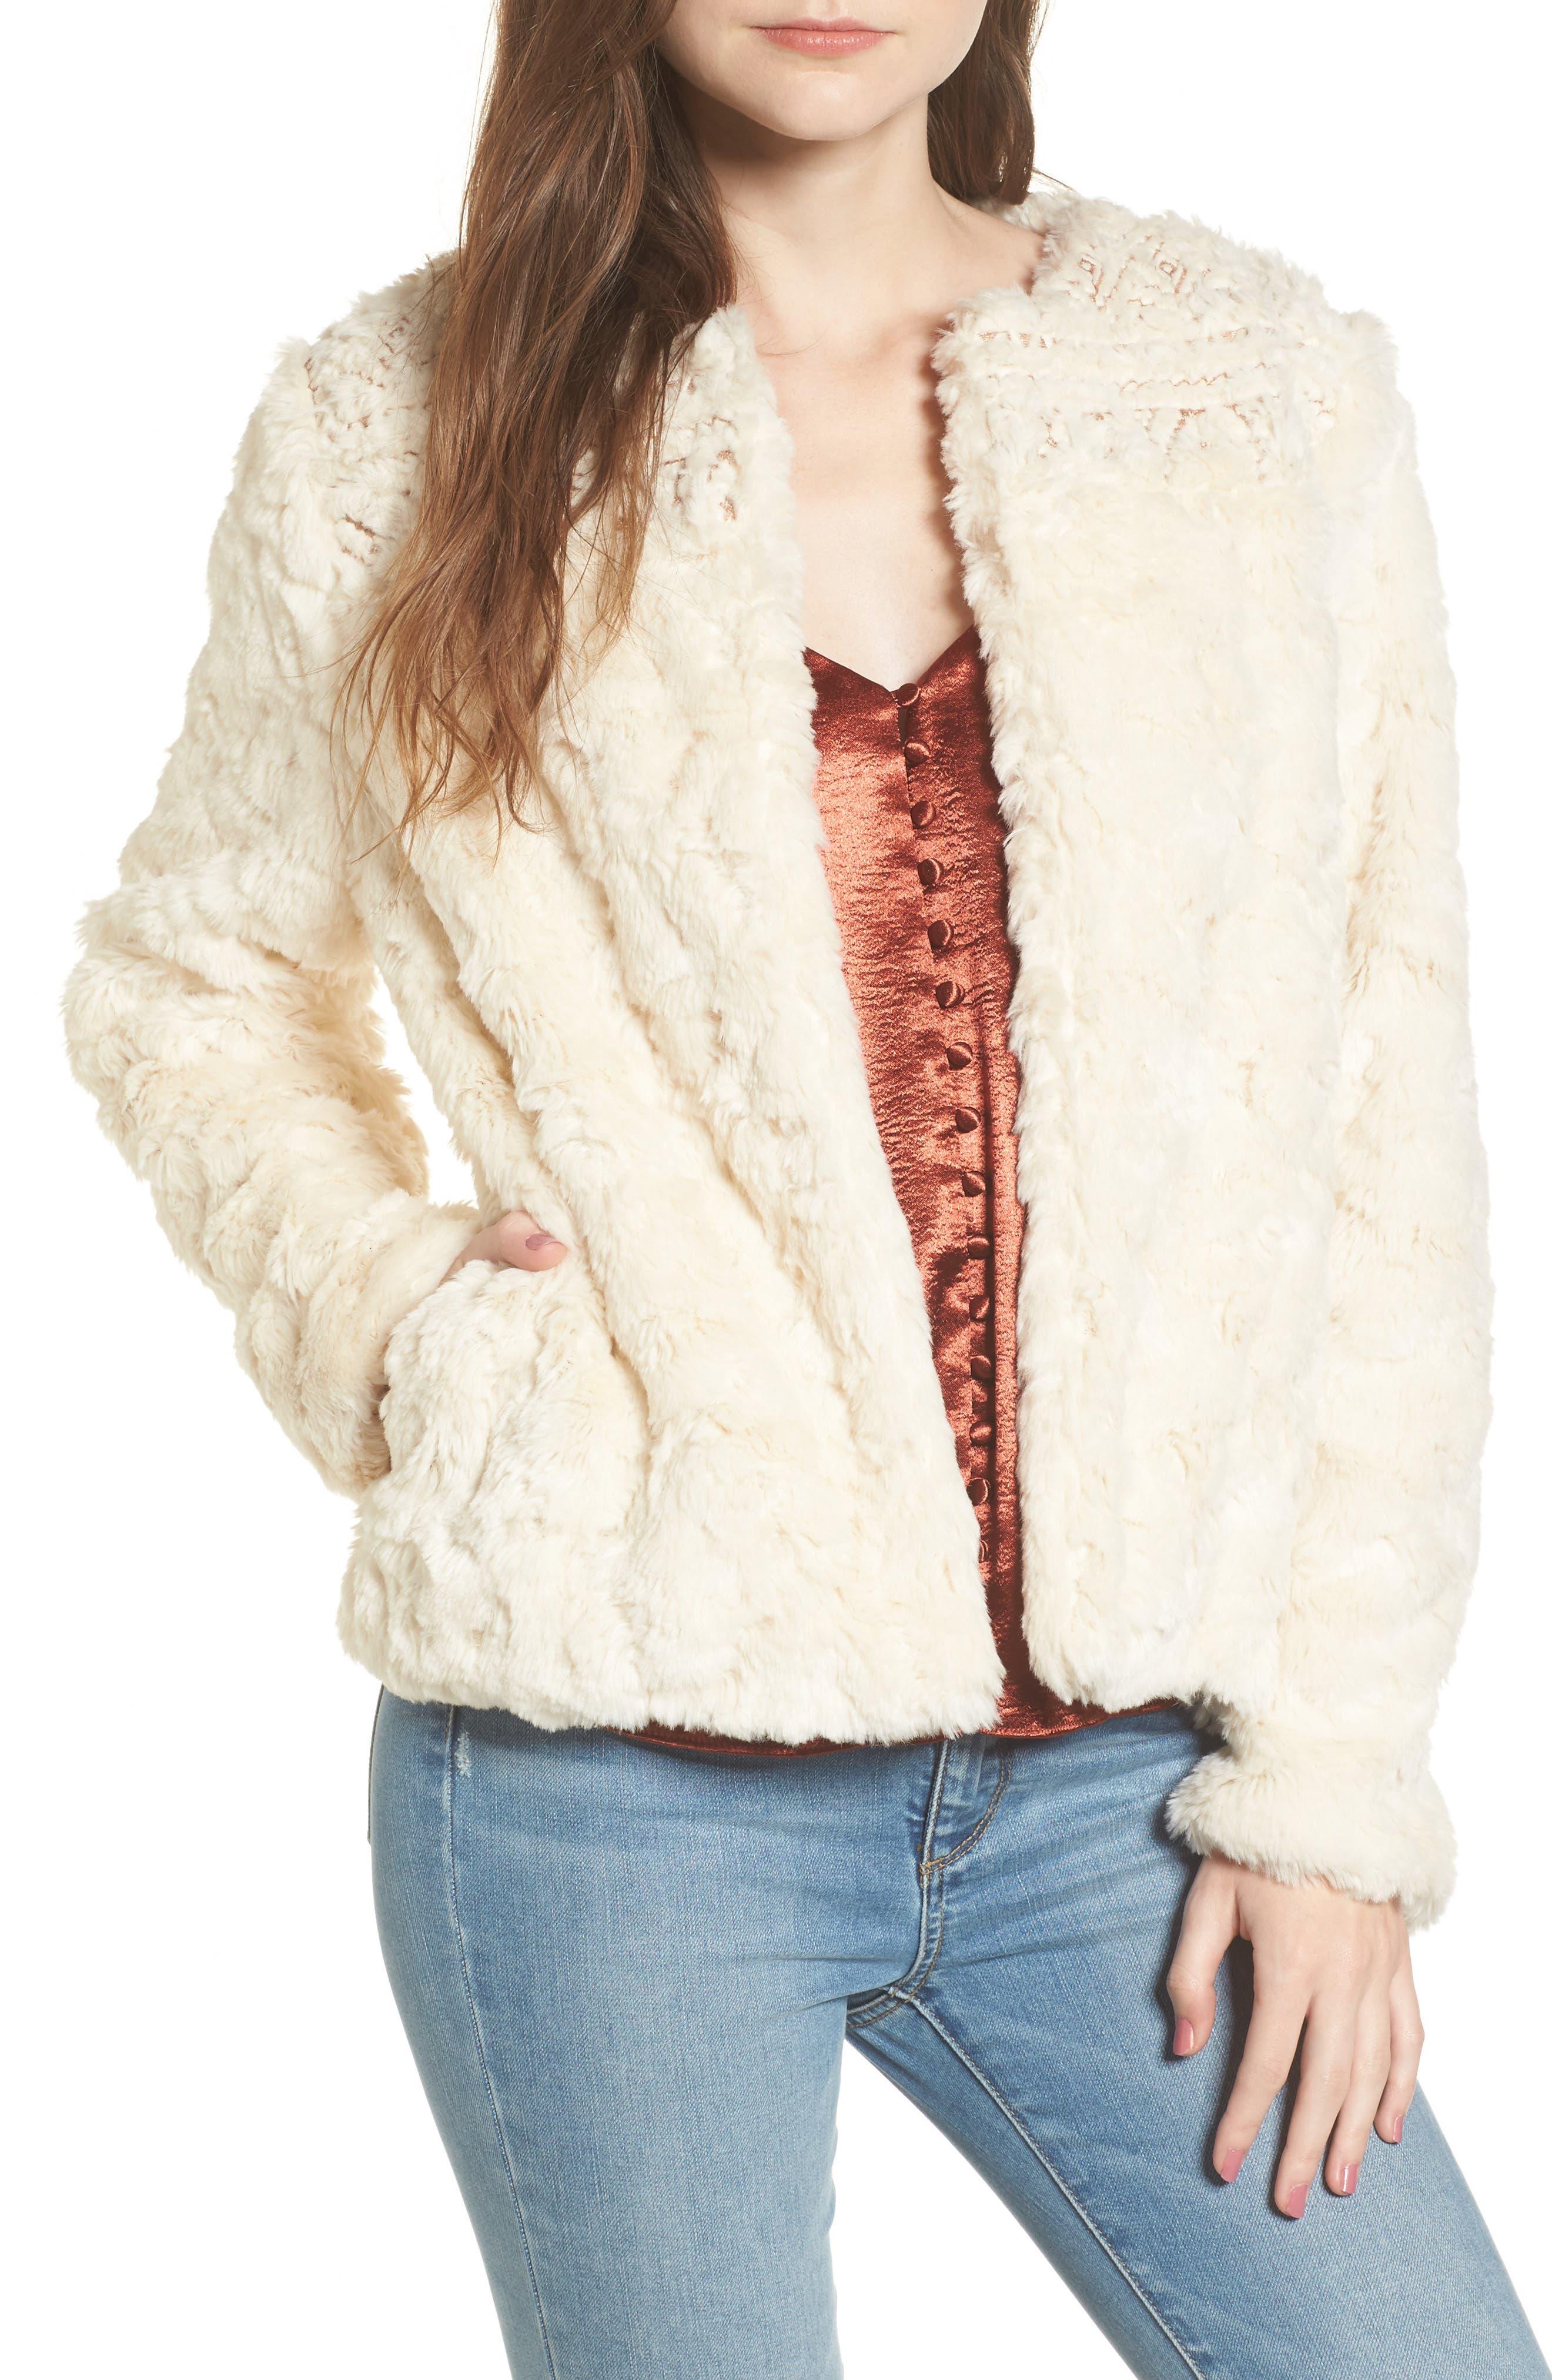 Metallic Embroidery Faux Fur Jacket,                             Main thumbnail 1, color,                             Ivory